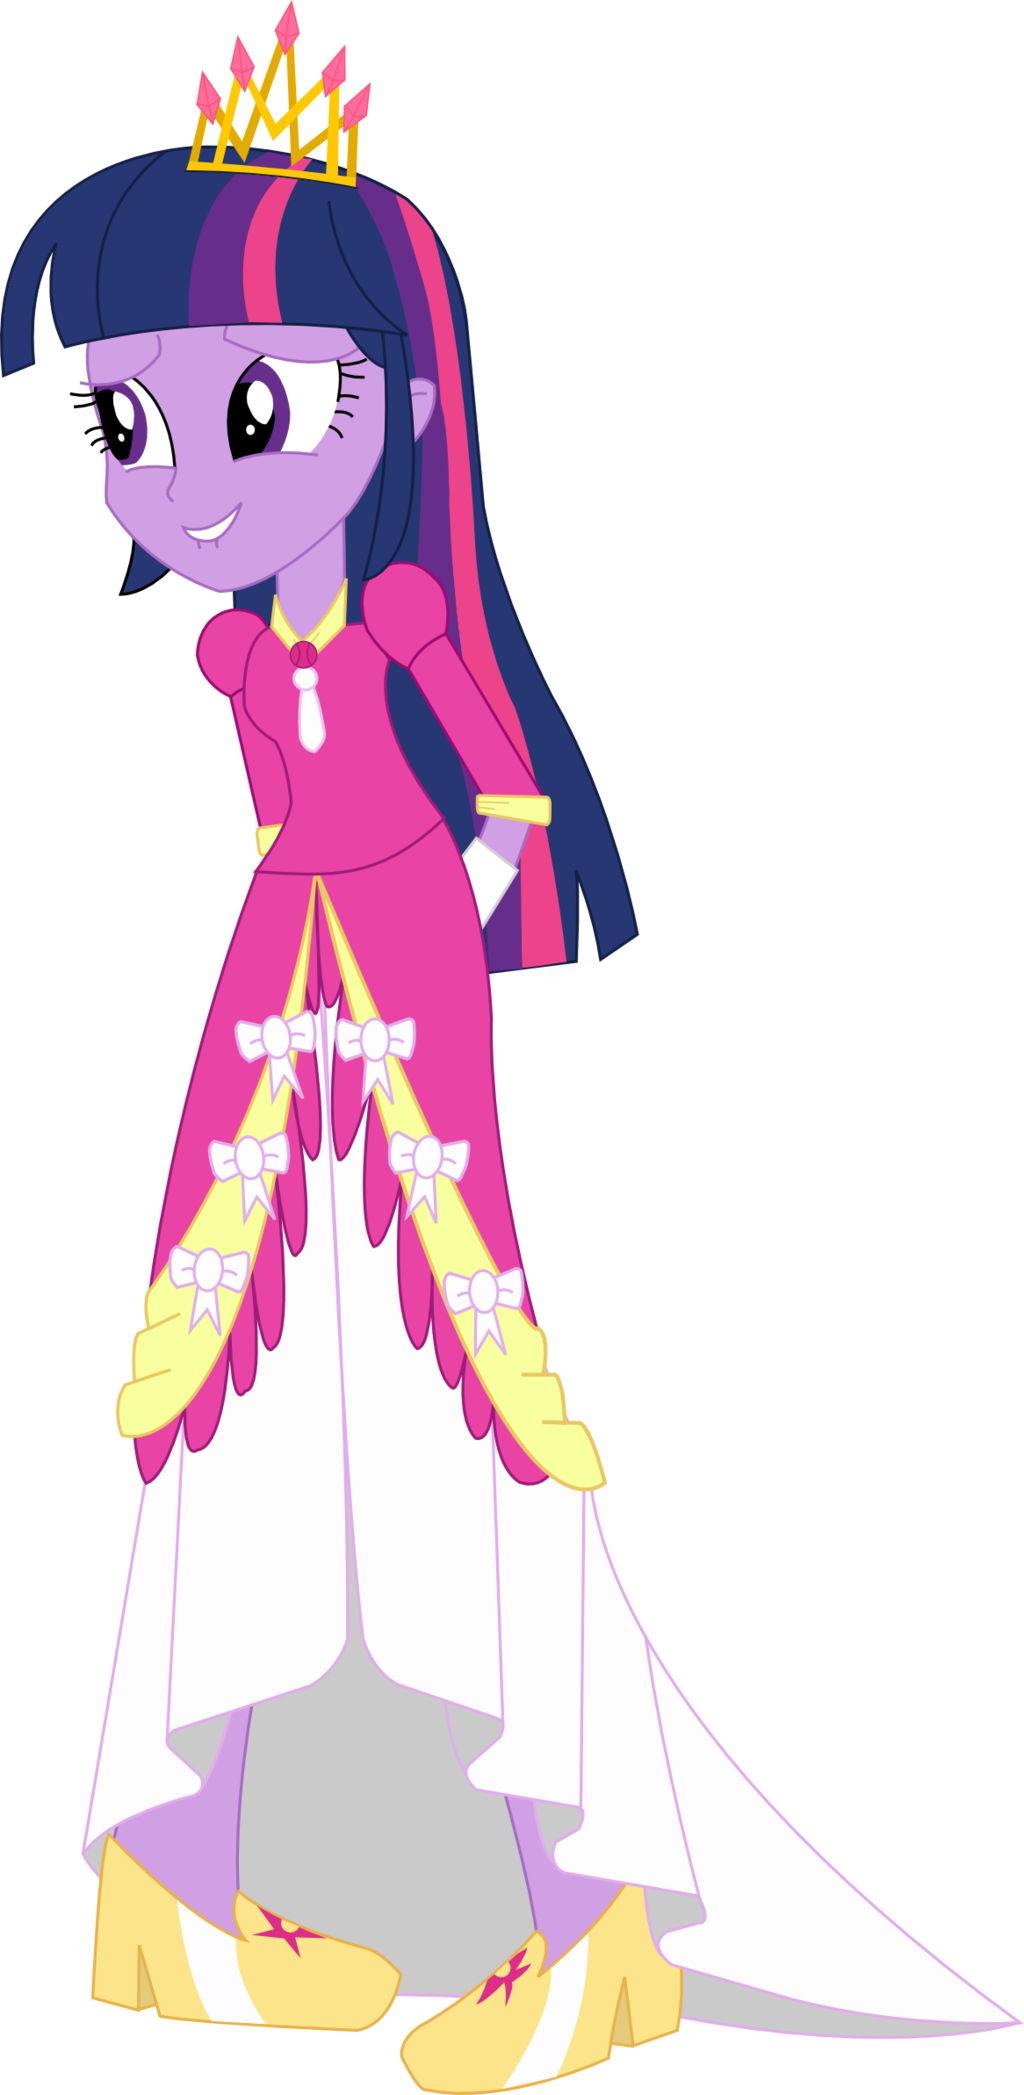 Twilight Sparkle Equestria Girls Dibujos Para Colorear De My Little Pony Humanas My Little Pony Equestria Girls Twilight Sparkle Princess Dress